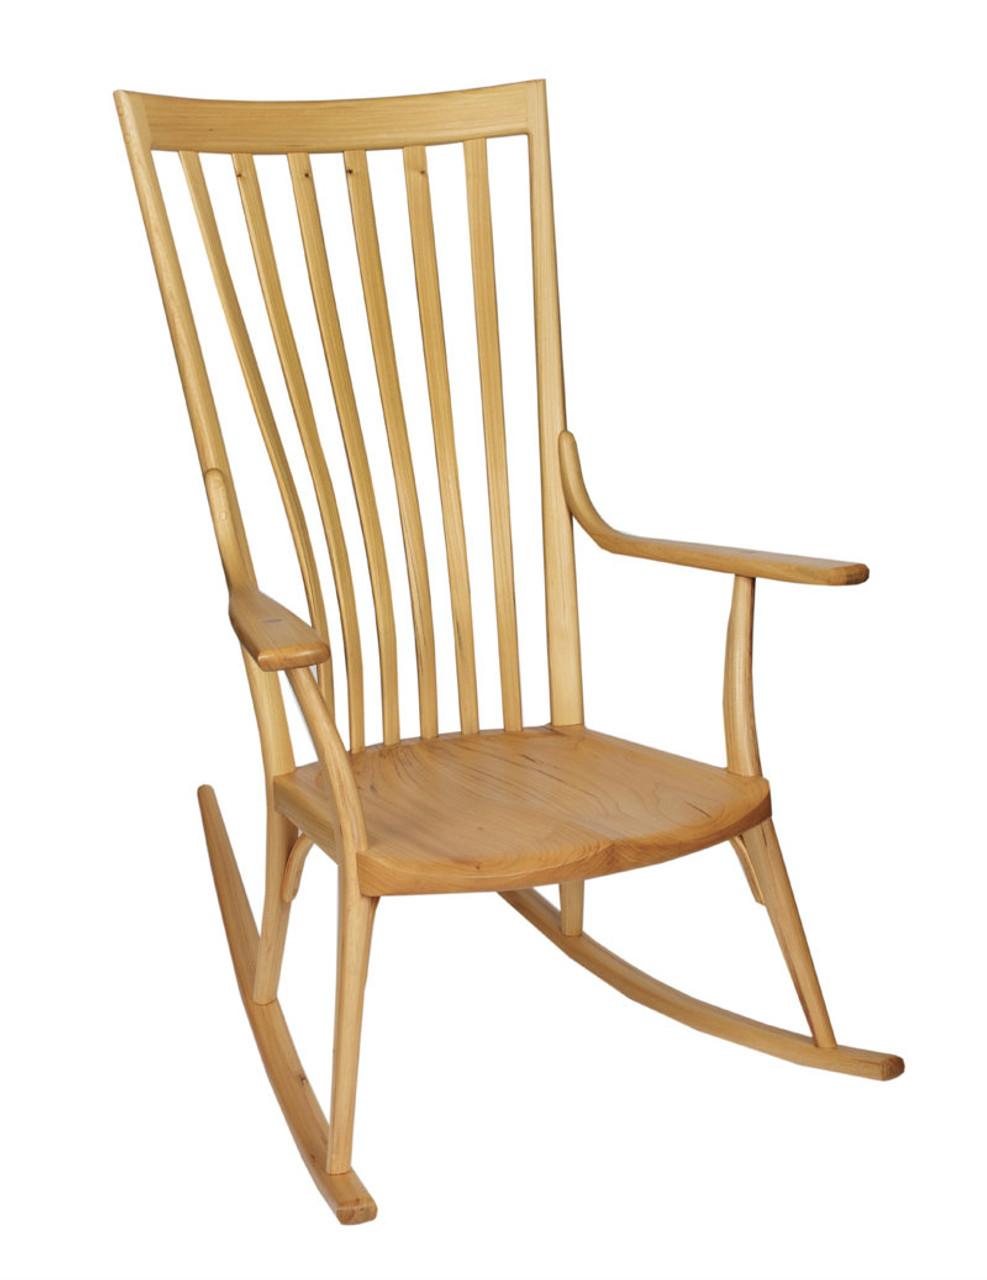 Sensational Penn State Elms Collection Artisan Line Rocking Chair Unemploymentrelief Wooden Chair Designs For Living Room Unemploymentrelieforg